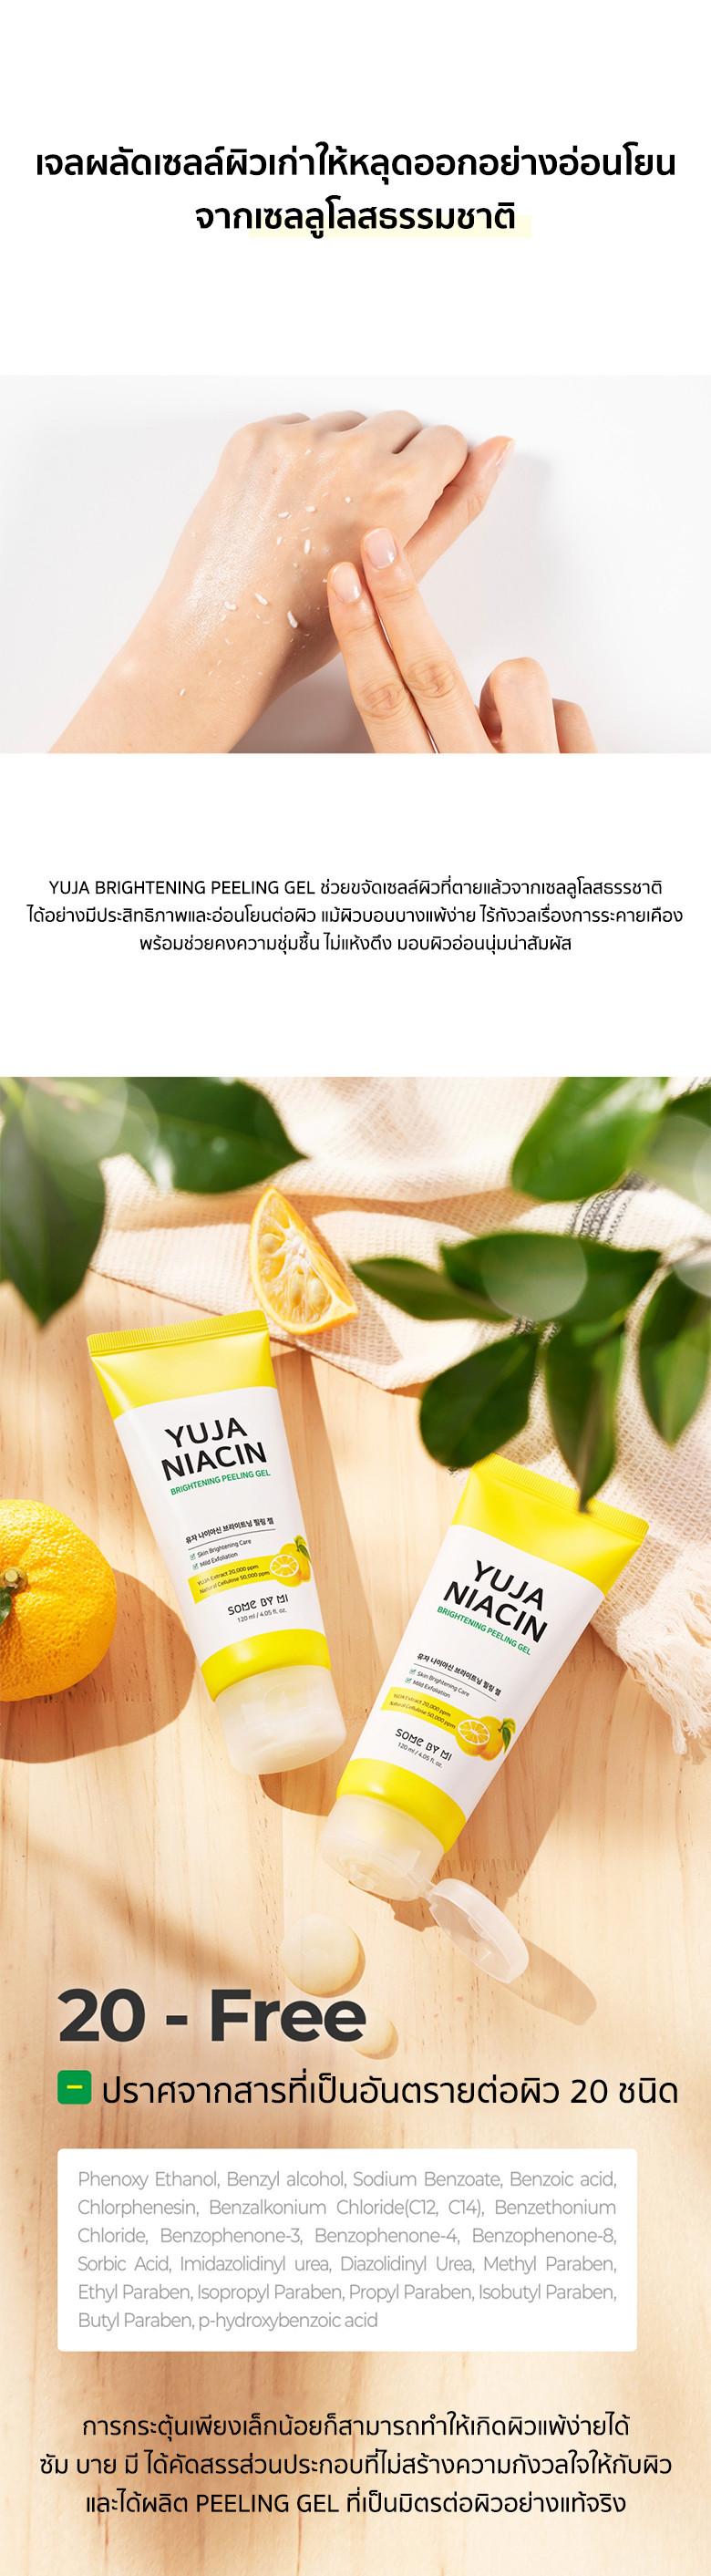 some_by_mi_yuja_niacin_brightening_peeli